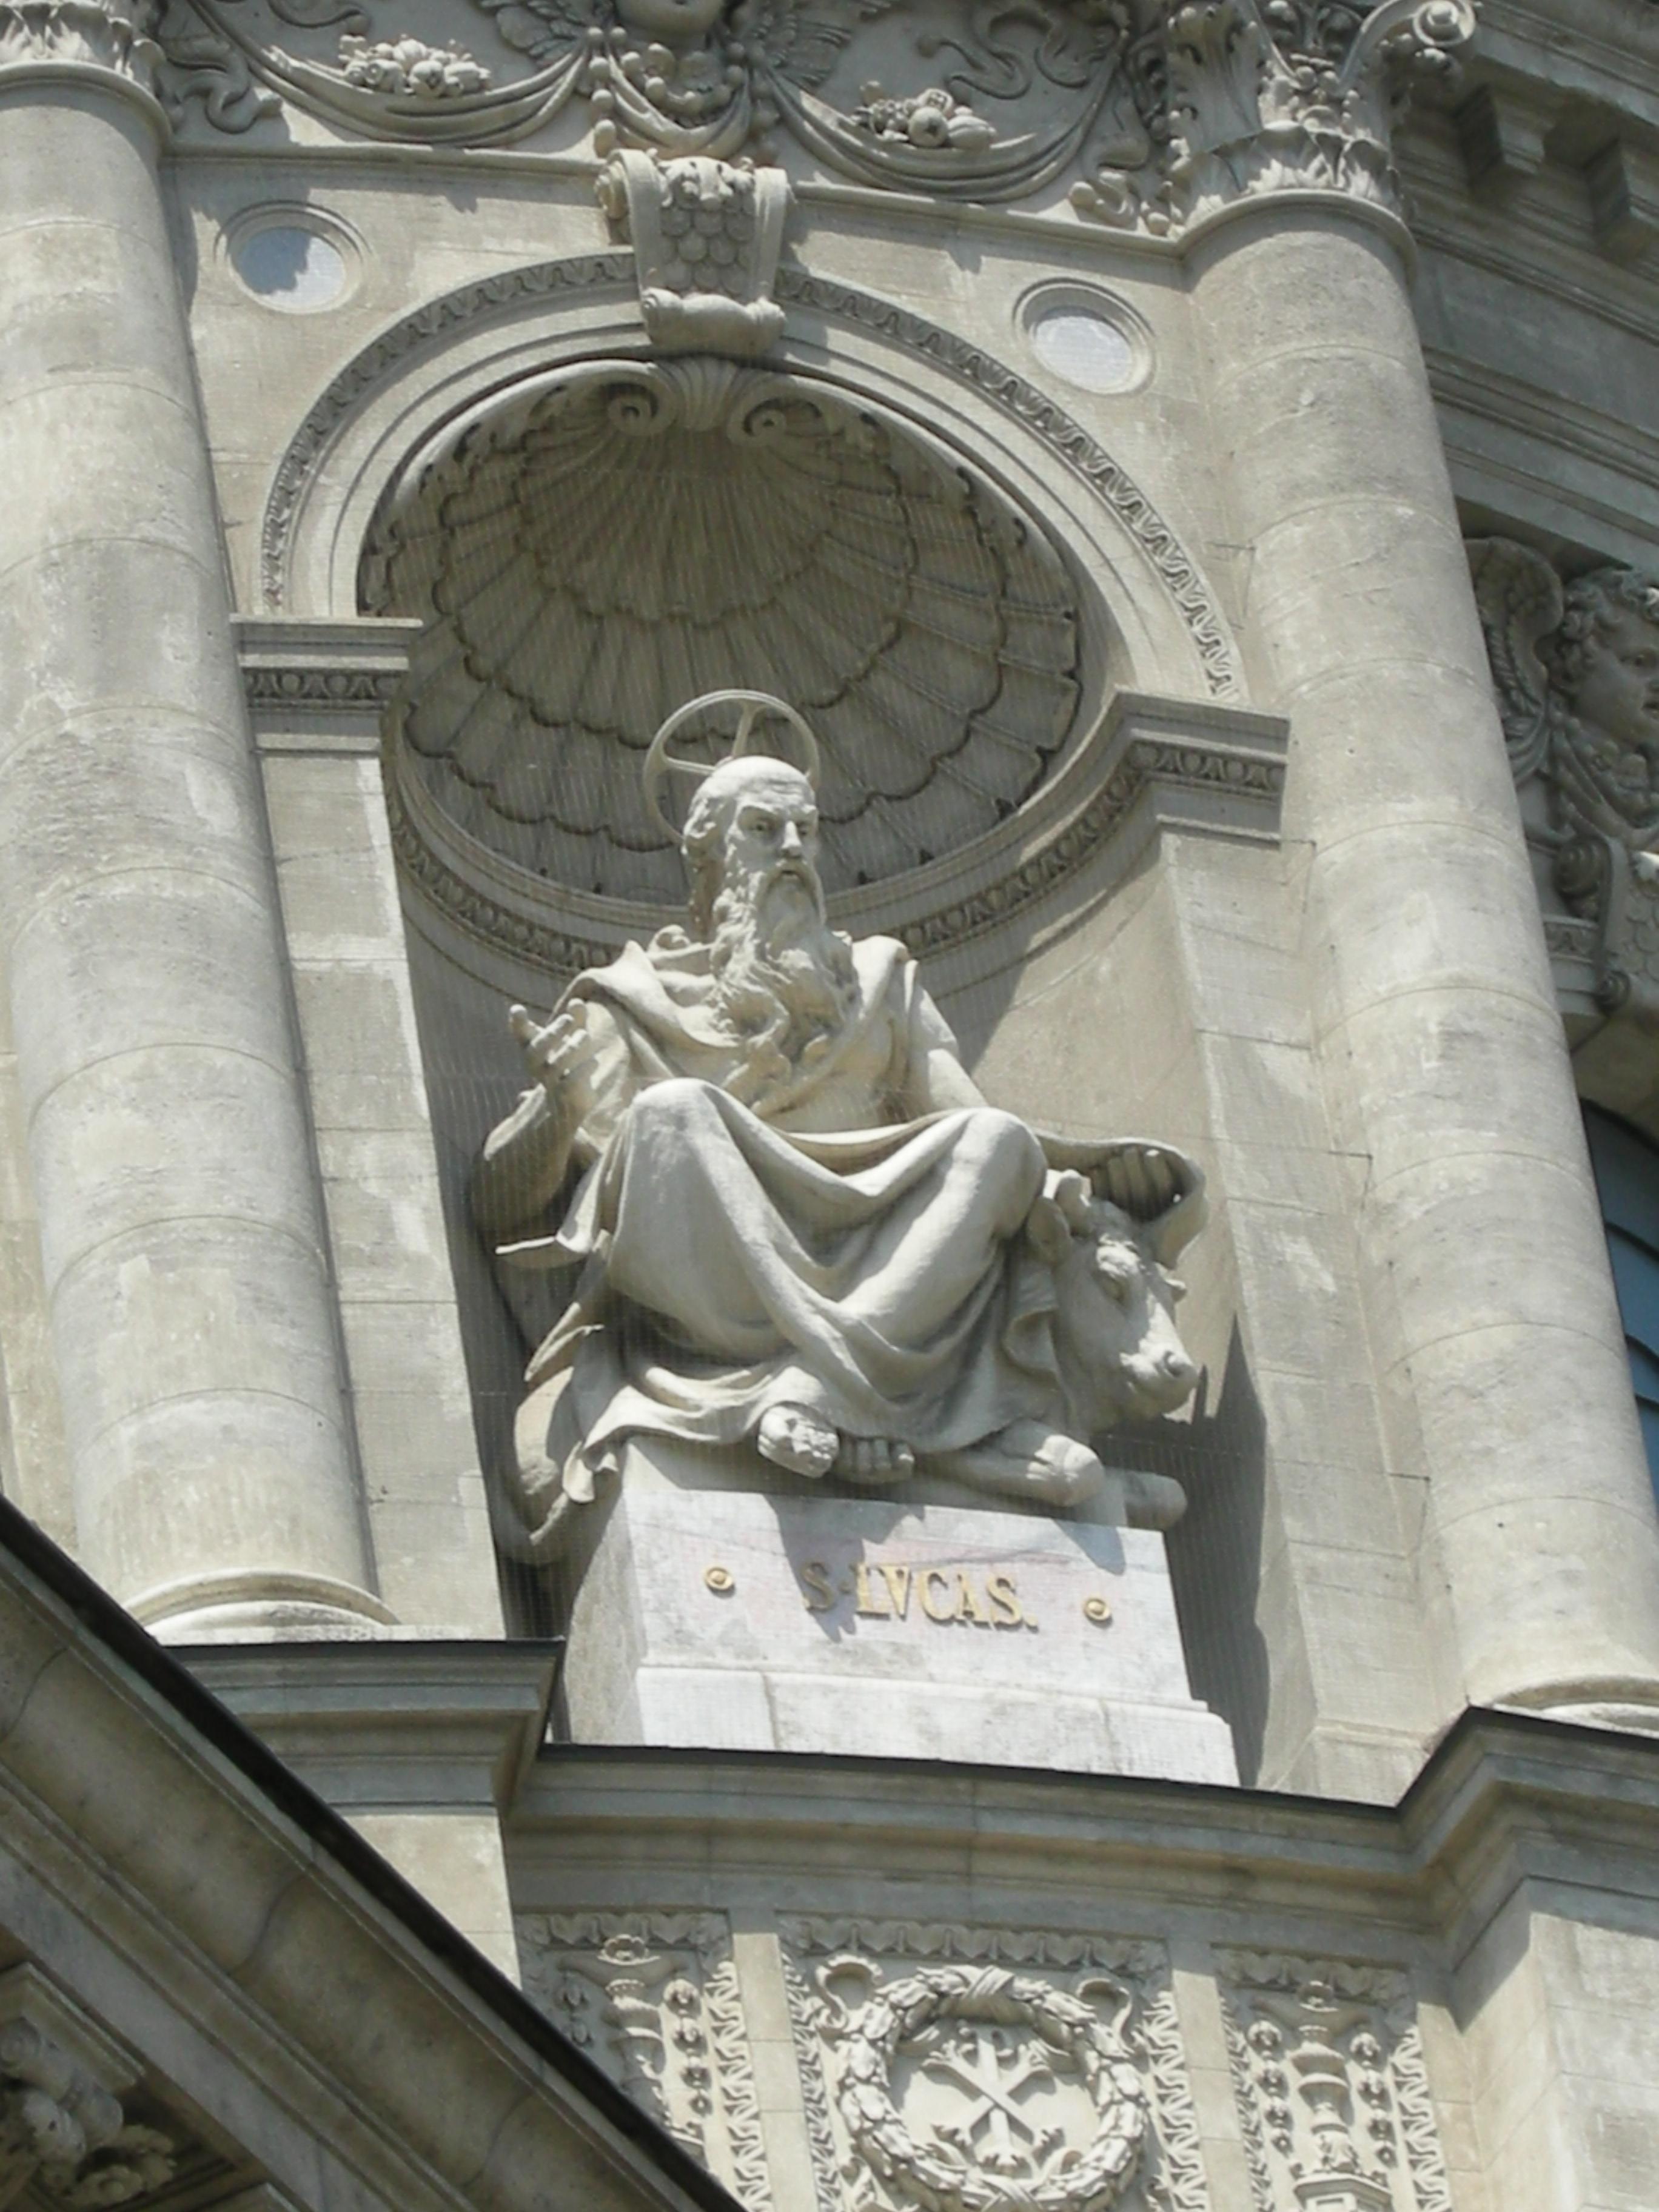 Statue of Luke the Evangelist, Saint Stephen's Basilica, BudapestDSCN3423.jpg